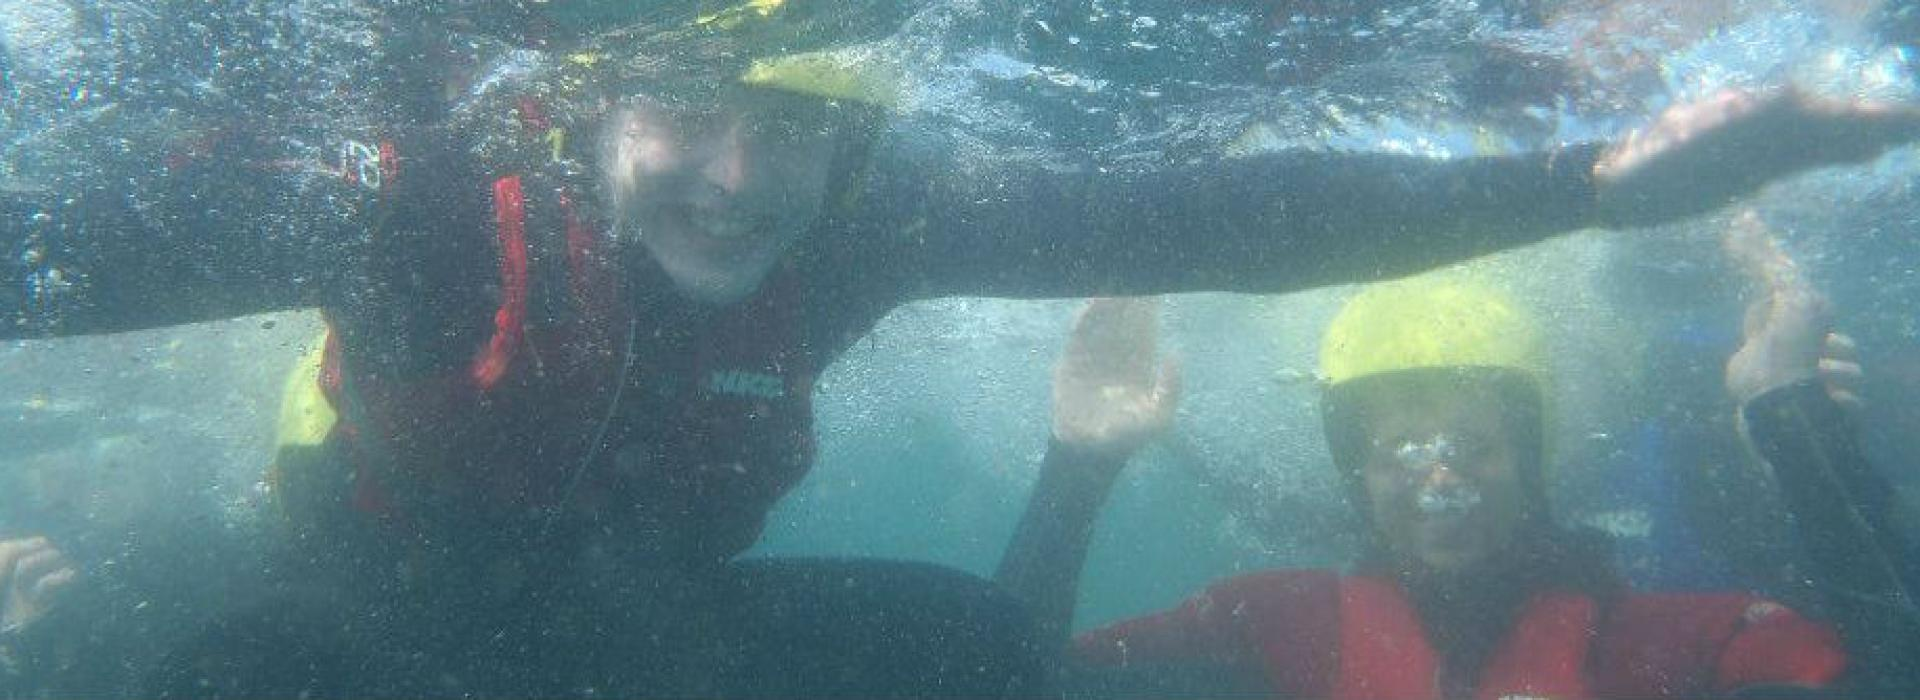 watermouth cove holiday park, ilfracombe, devon, ex349sj